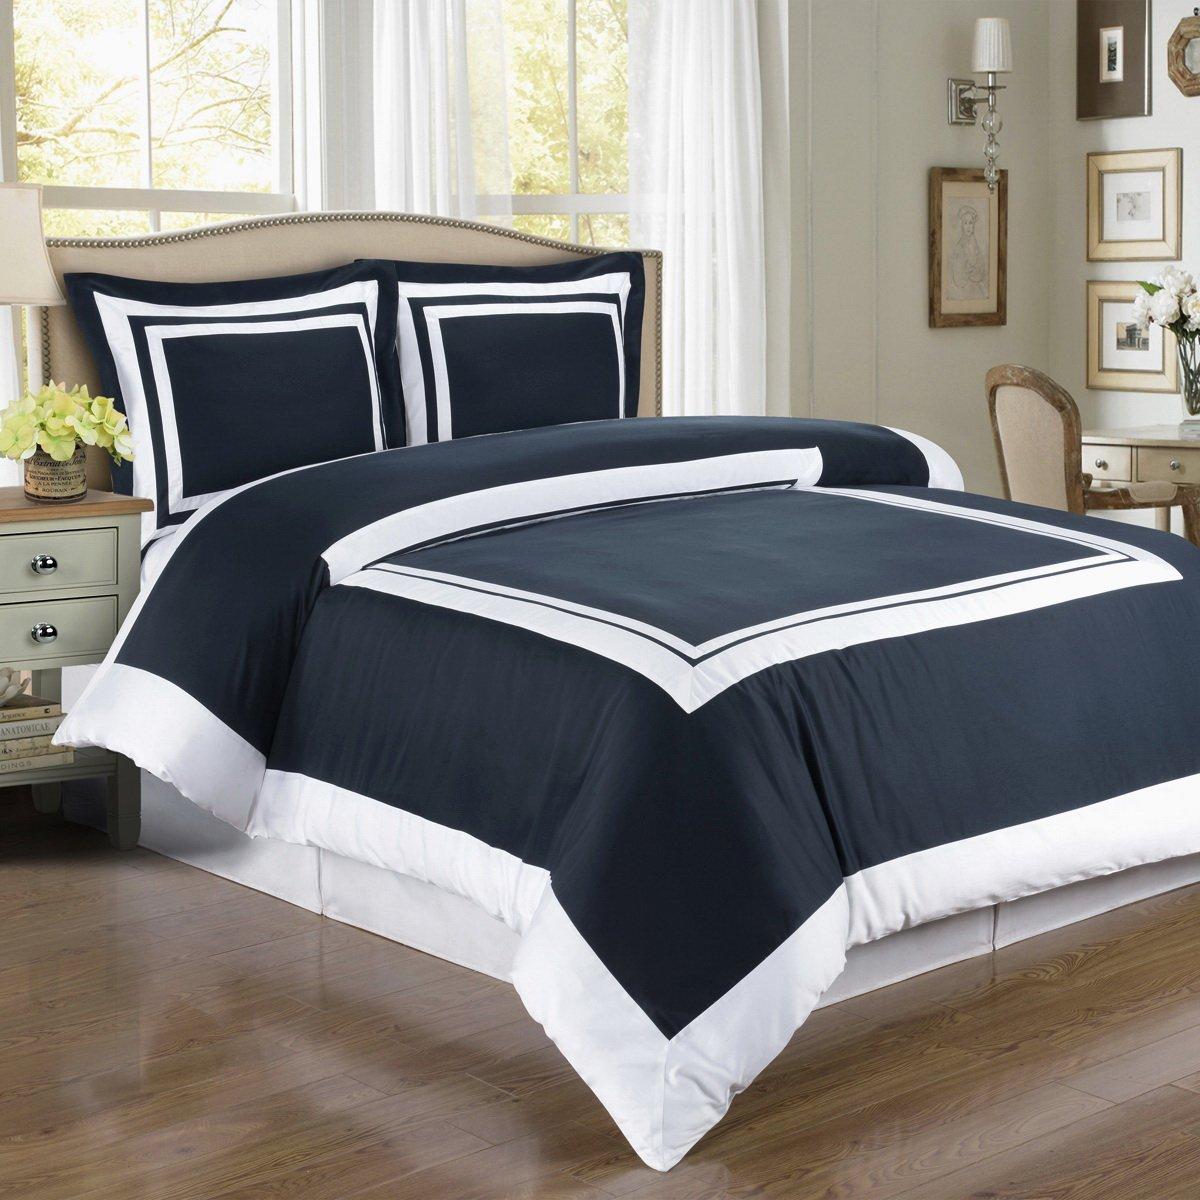 amazoncom duvet cover navy blue white border design pattern full queen double 100 egyptian cotton 3 piece bedding and shams pillowcases set home u0026 - White Duvet Cover Queen